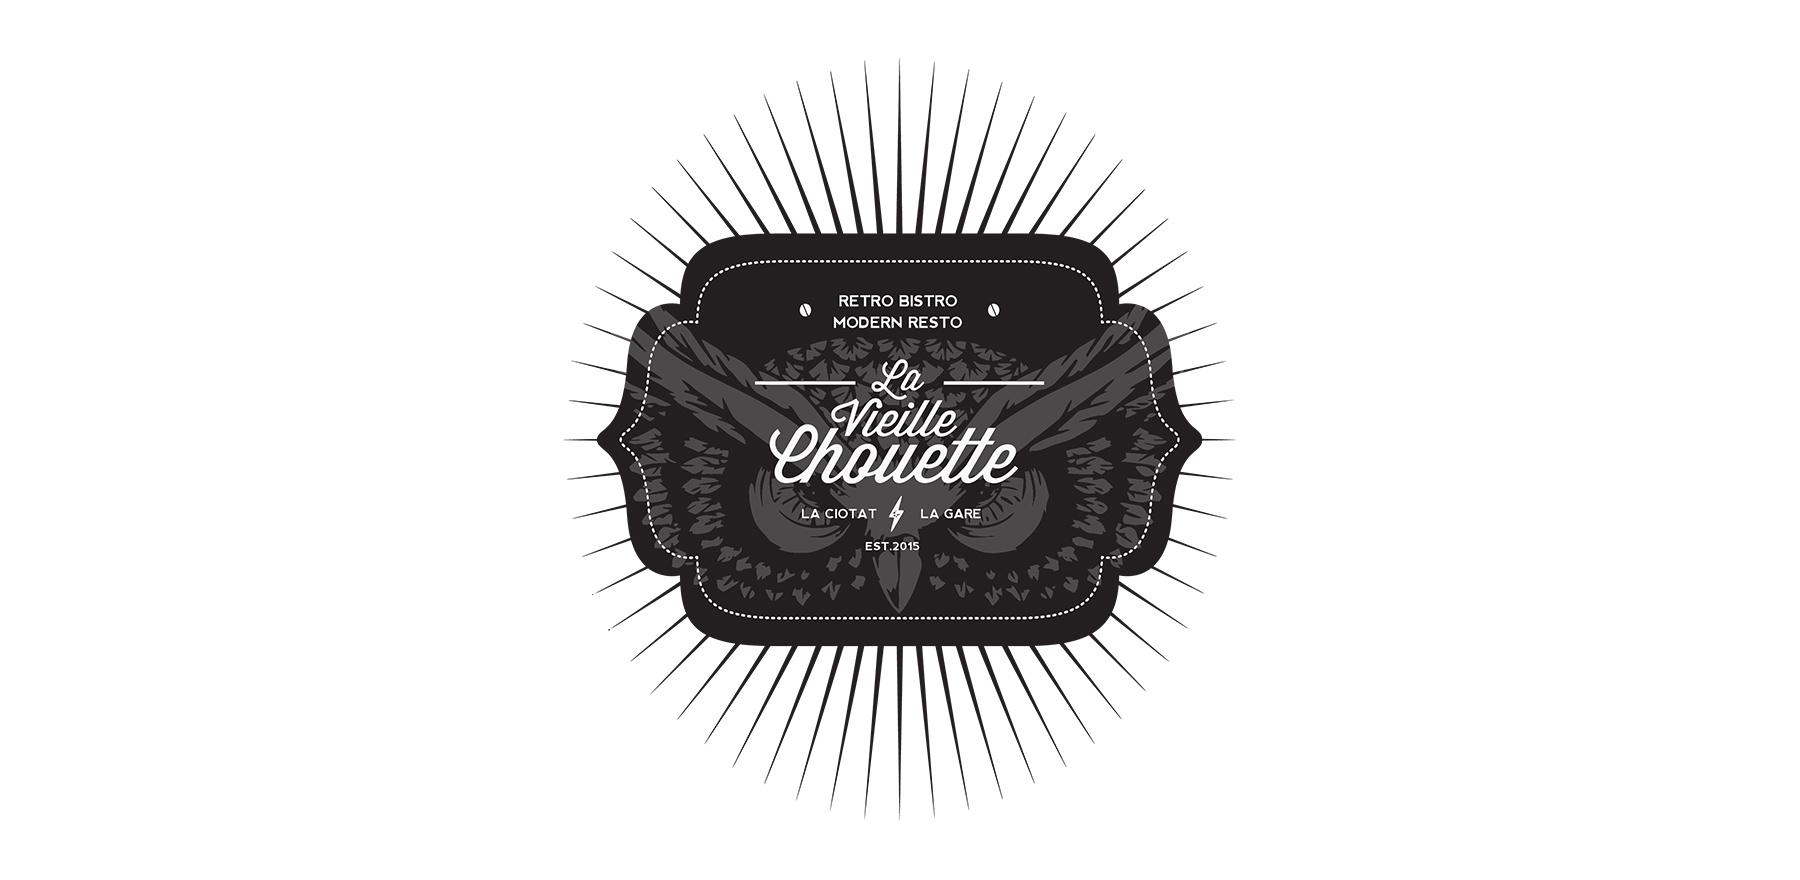 vieille-chouette-logo